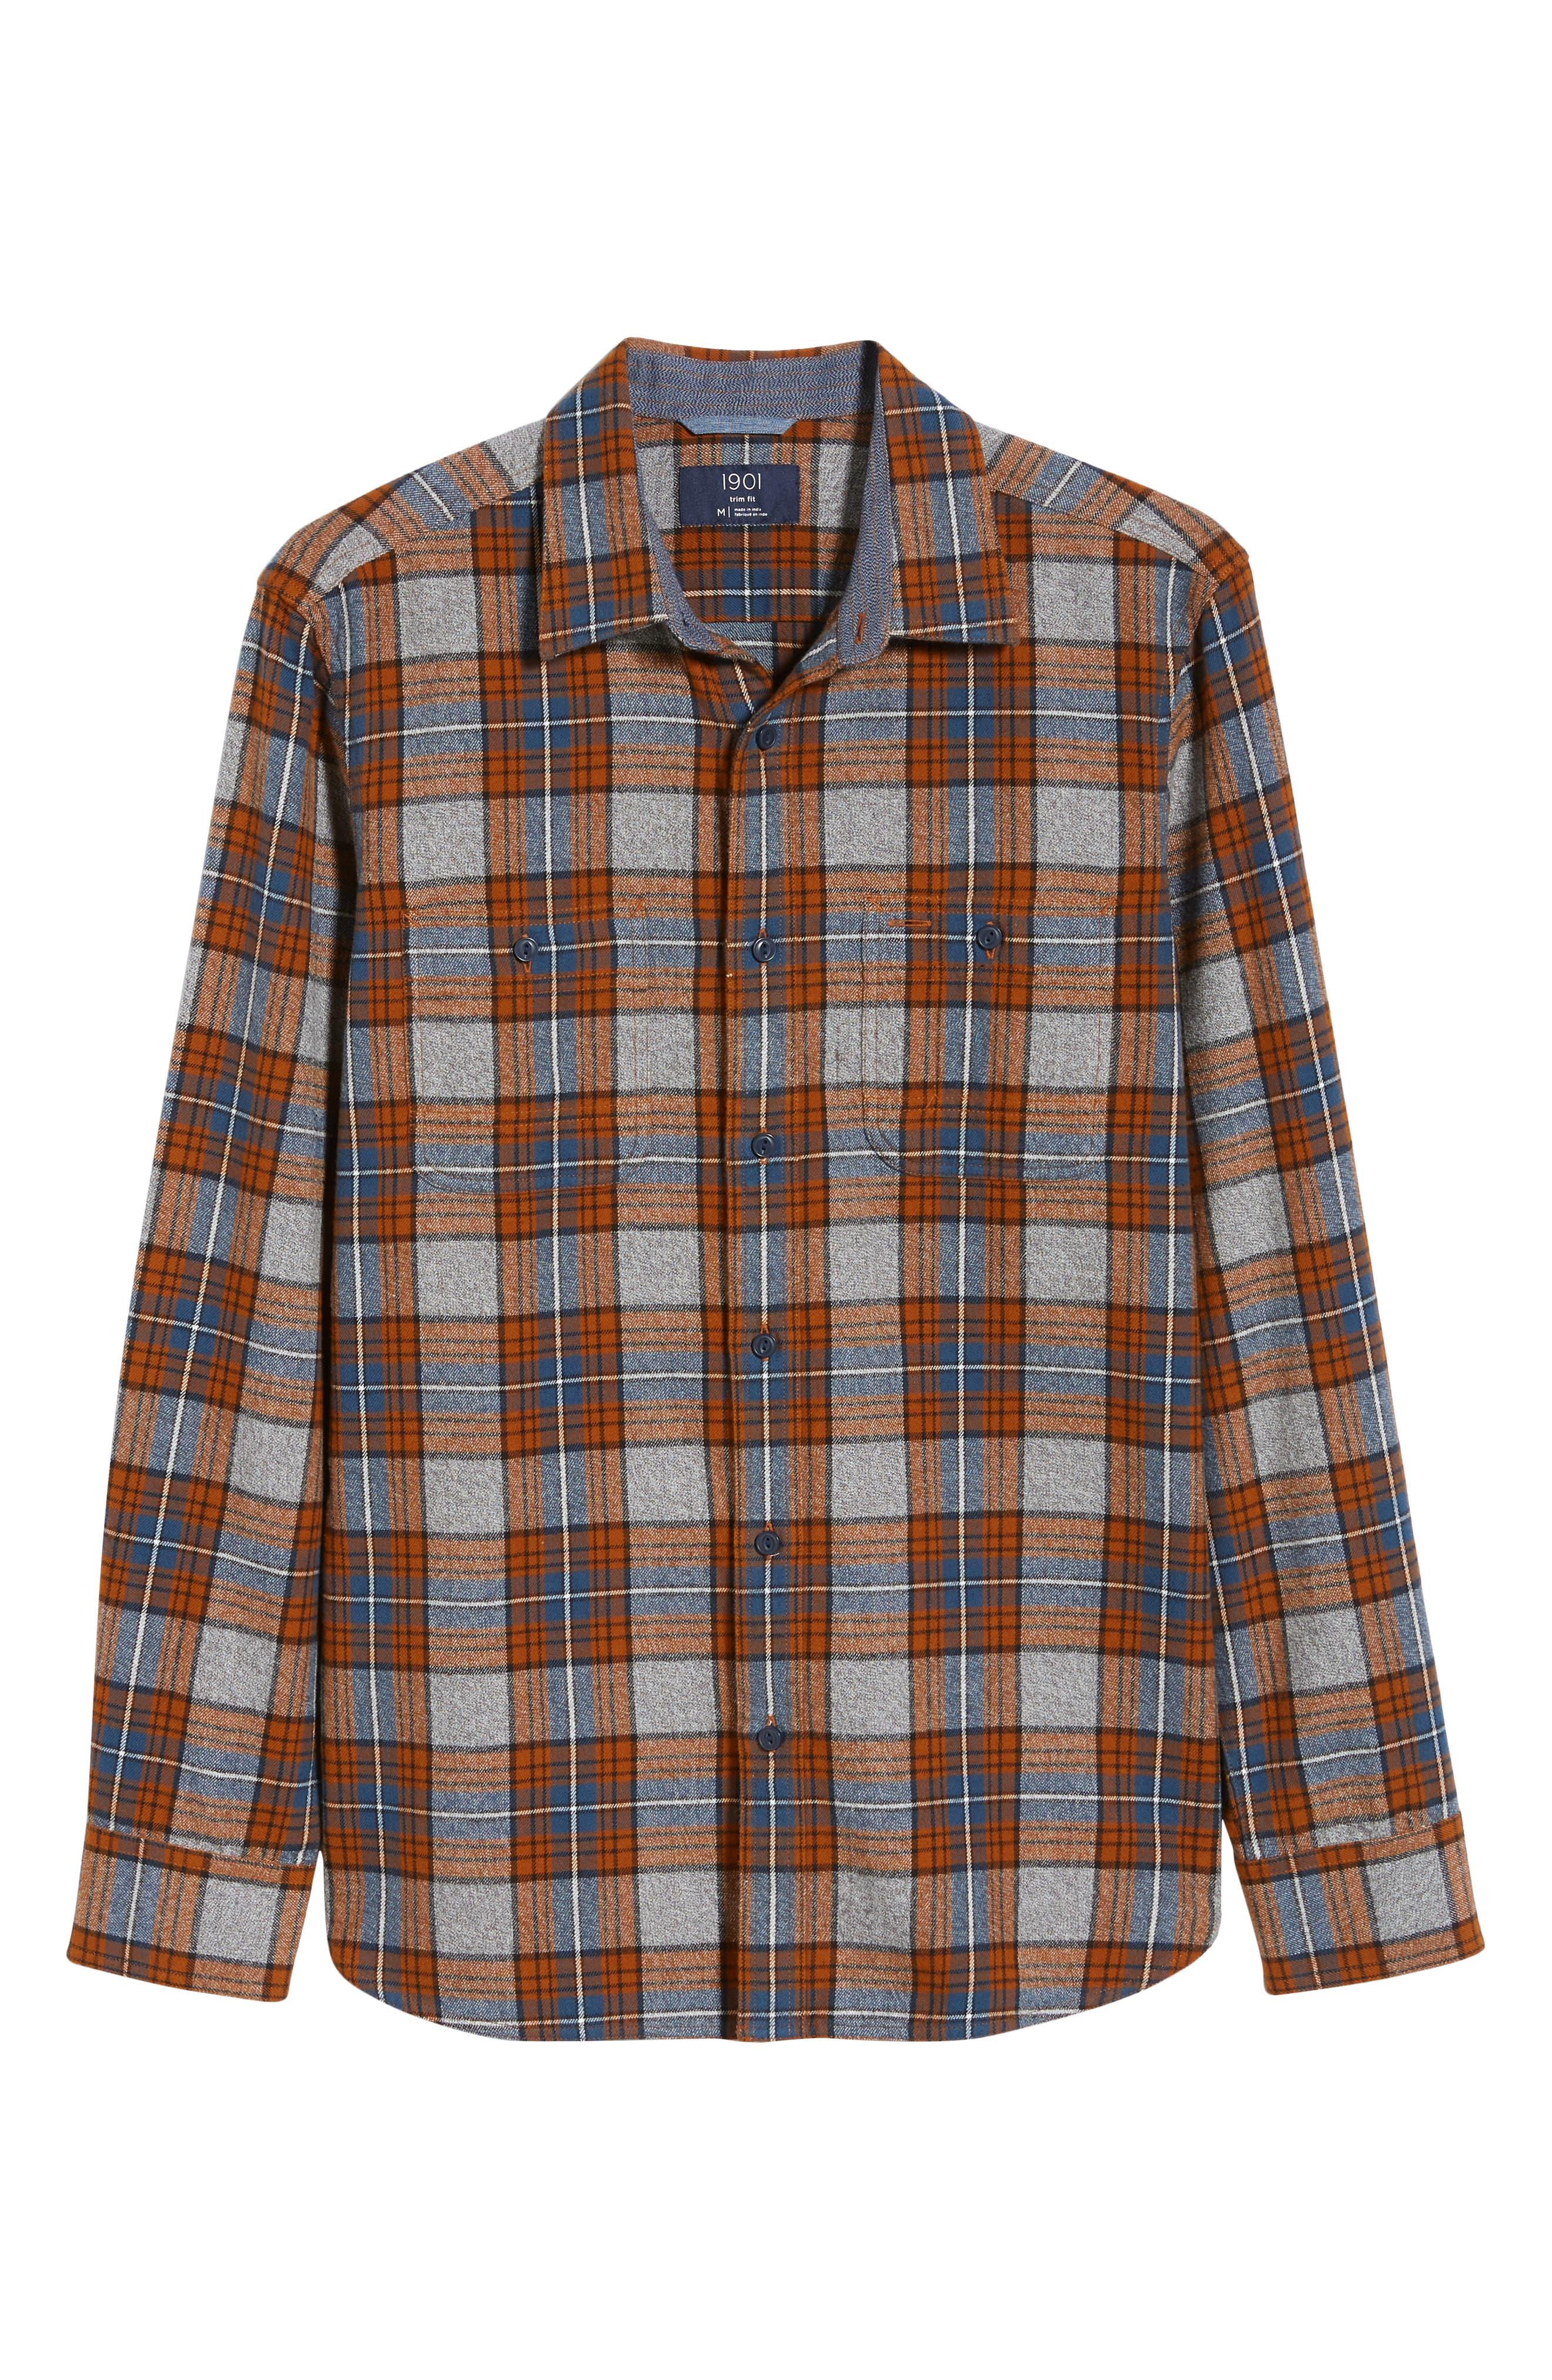 Regular Fit Workwear Plaid Flannel Shirt,                             Alternate thumbnail 6, color,                             030